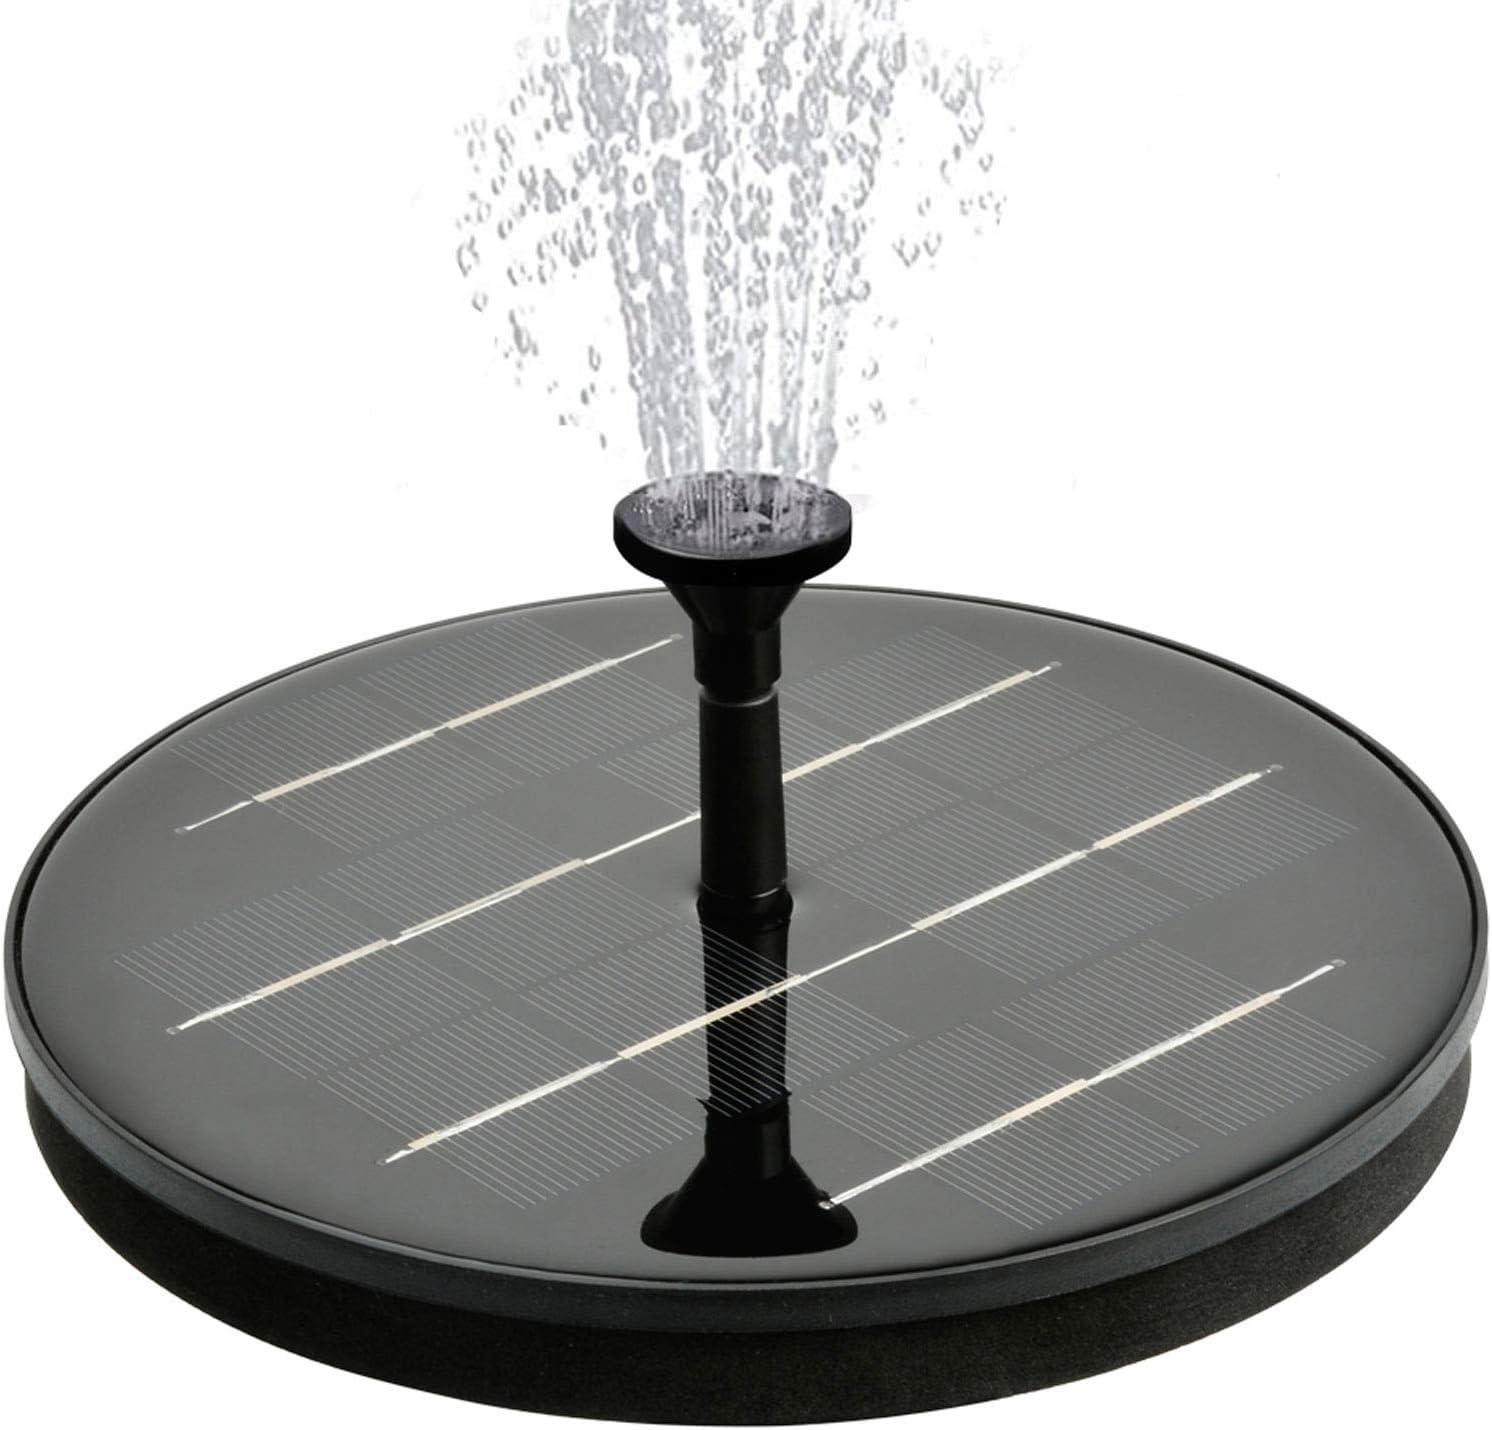 Muasdae Solar Fountain Pump,Free Standing Bird Bath Fountain Water Pump, 2.4W Outdoor Floating Fountain Pump Kit for Garden, Pond, Pool, Bird Bath,Aquarium